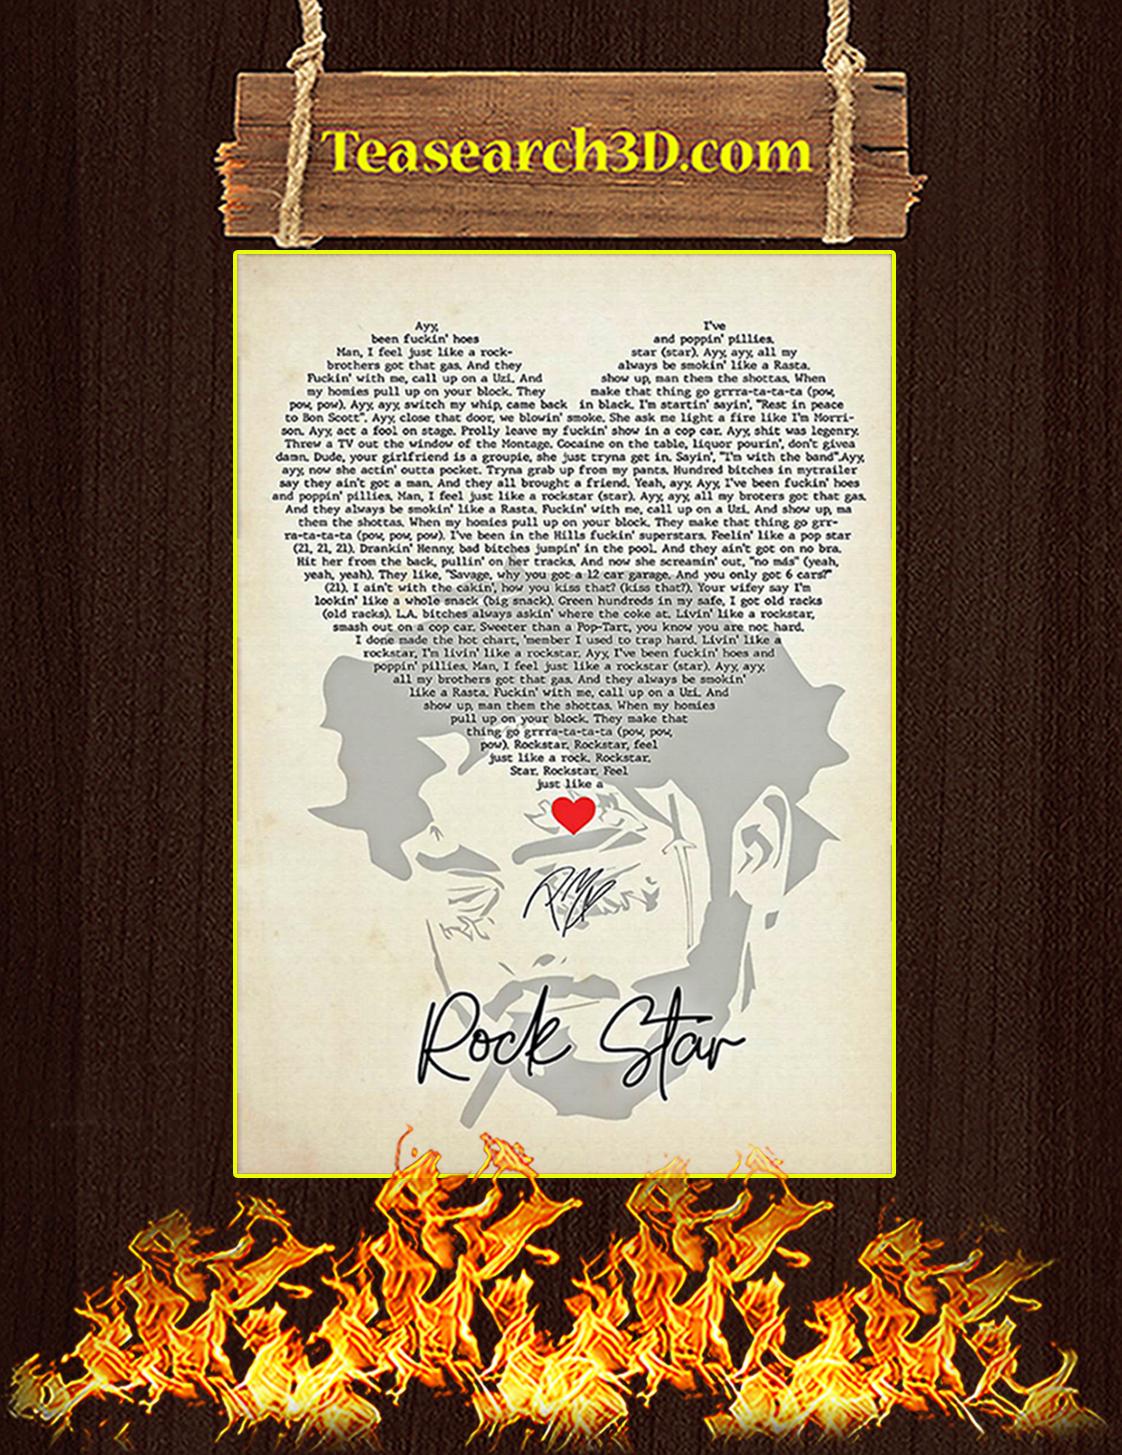 Rock star signature poster A3